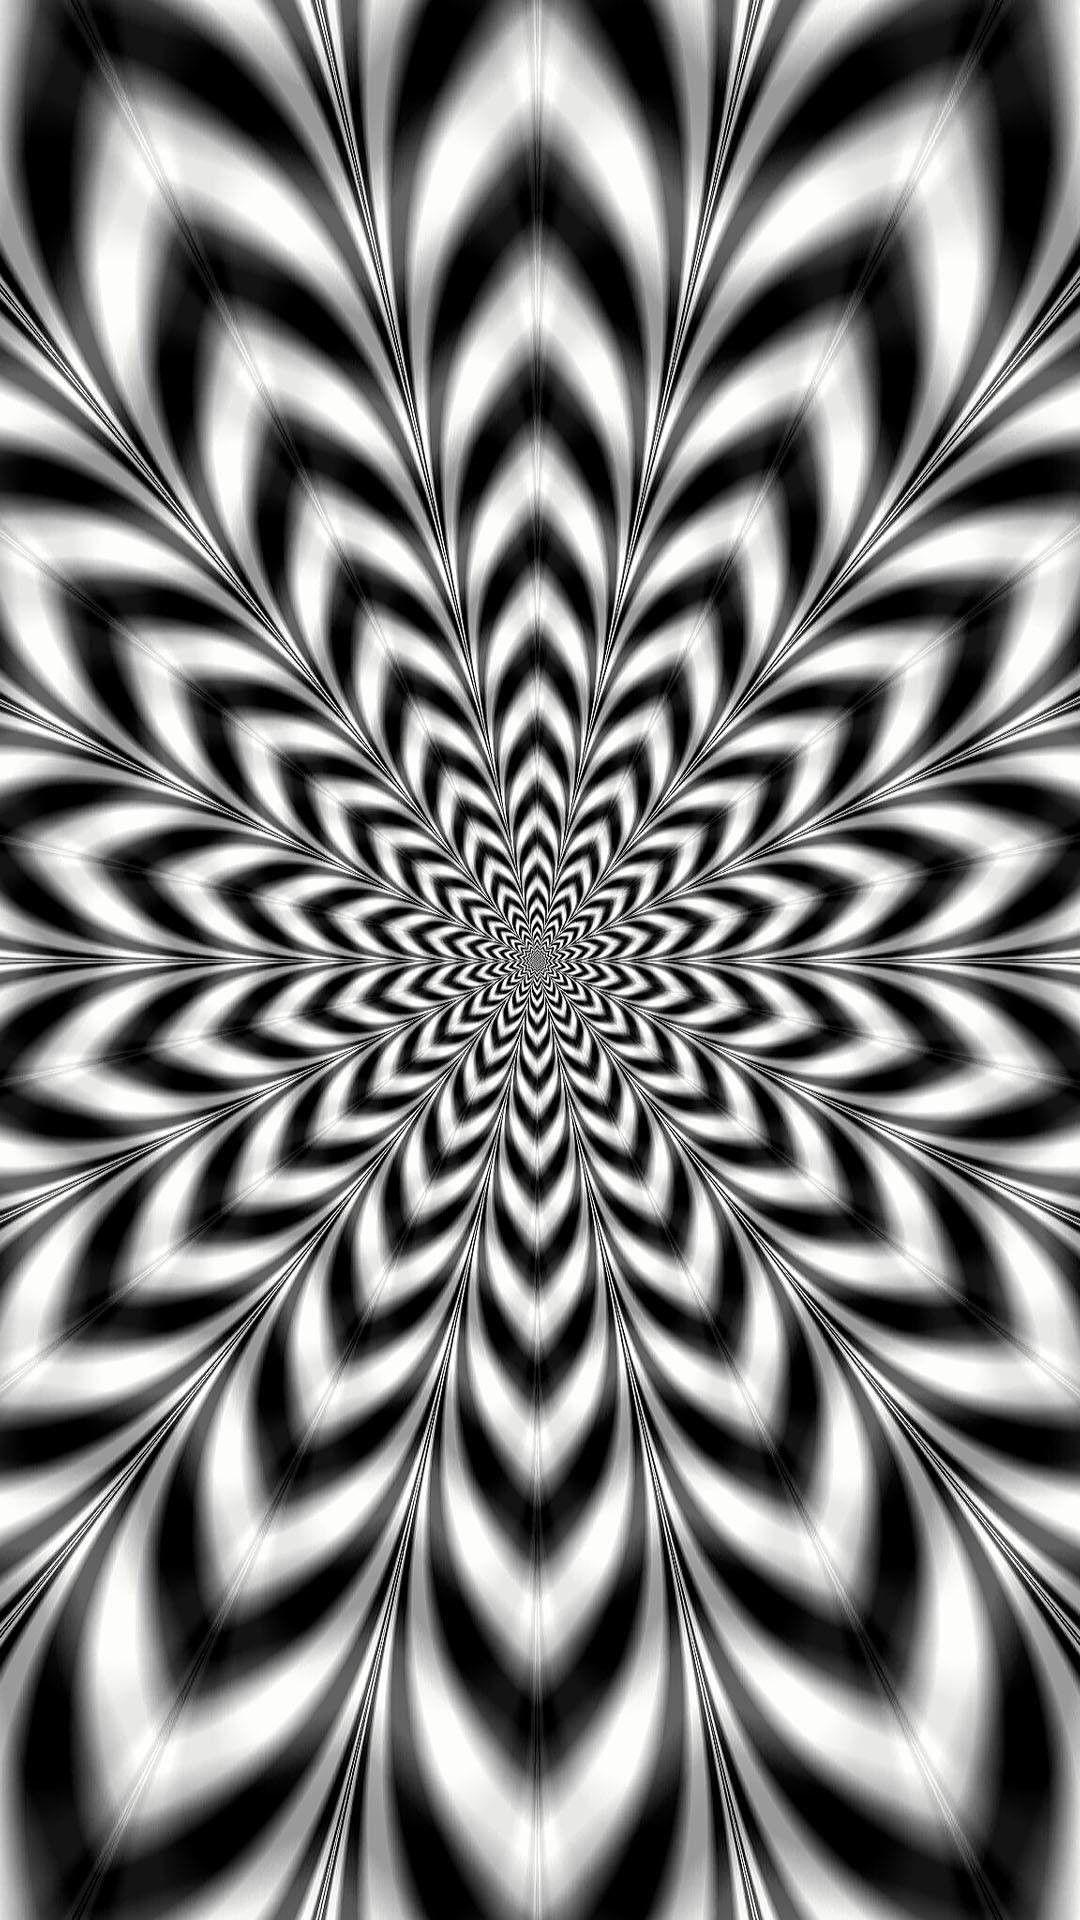 Ilusiones Chebres Optical Illusion Wallpaper Illusion Art Optical Illusions Art